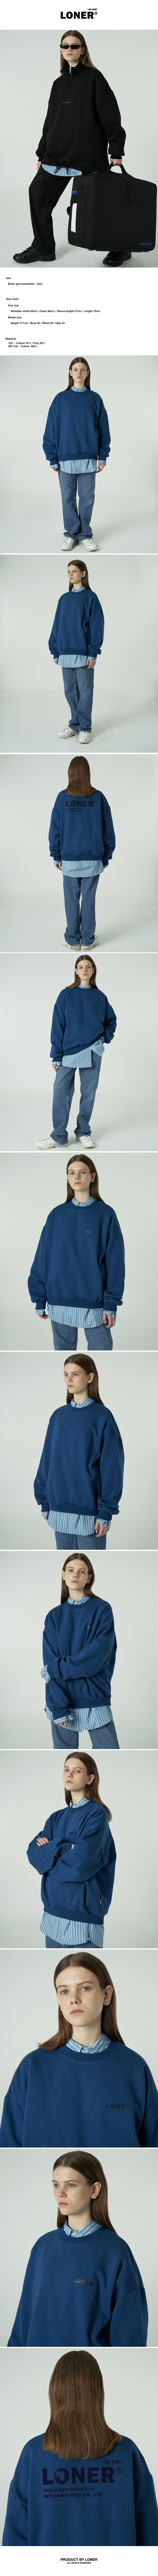 Basic gmt sweatshirt-blue.jpg